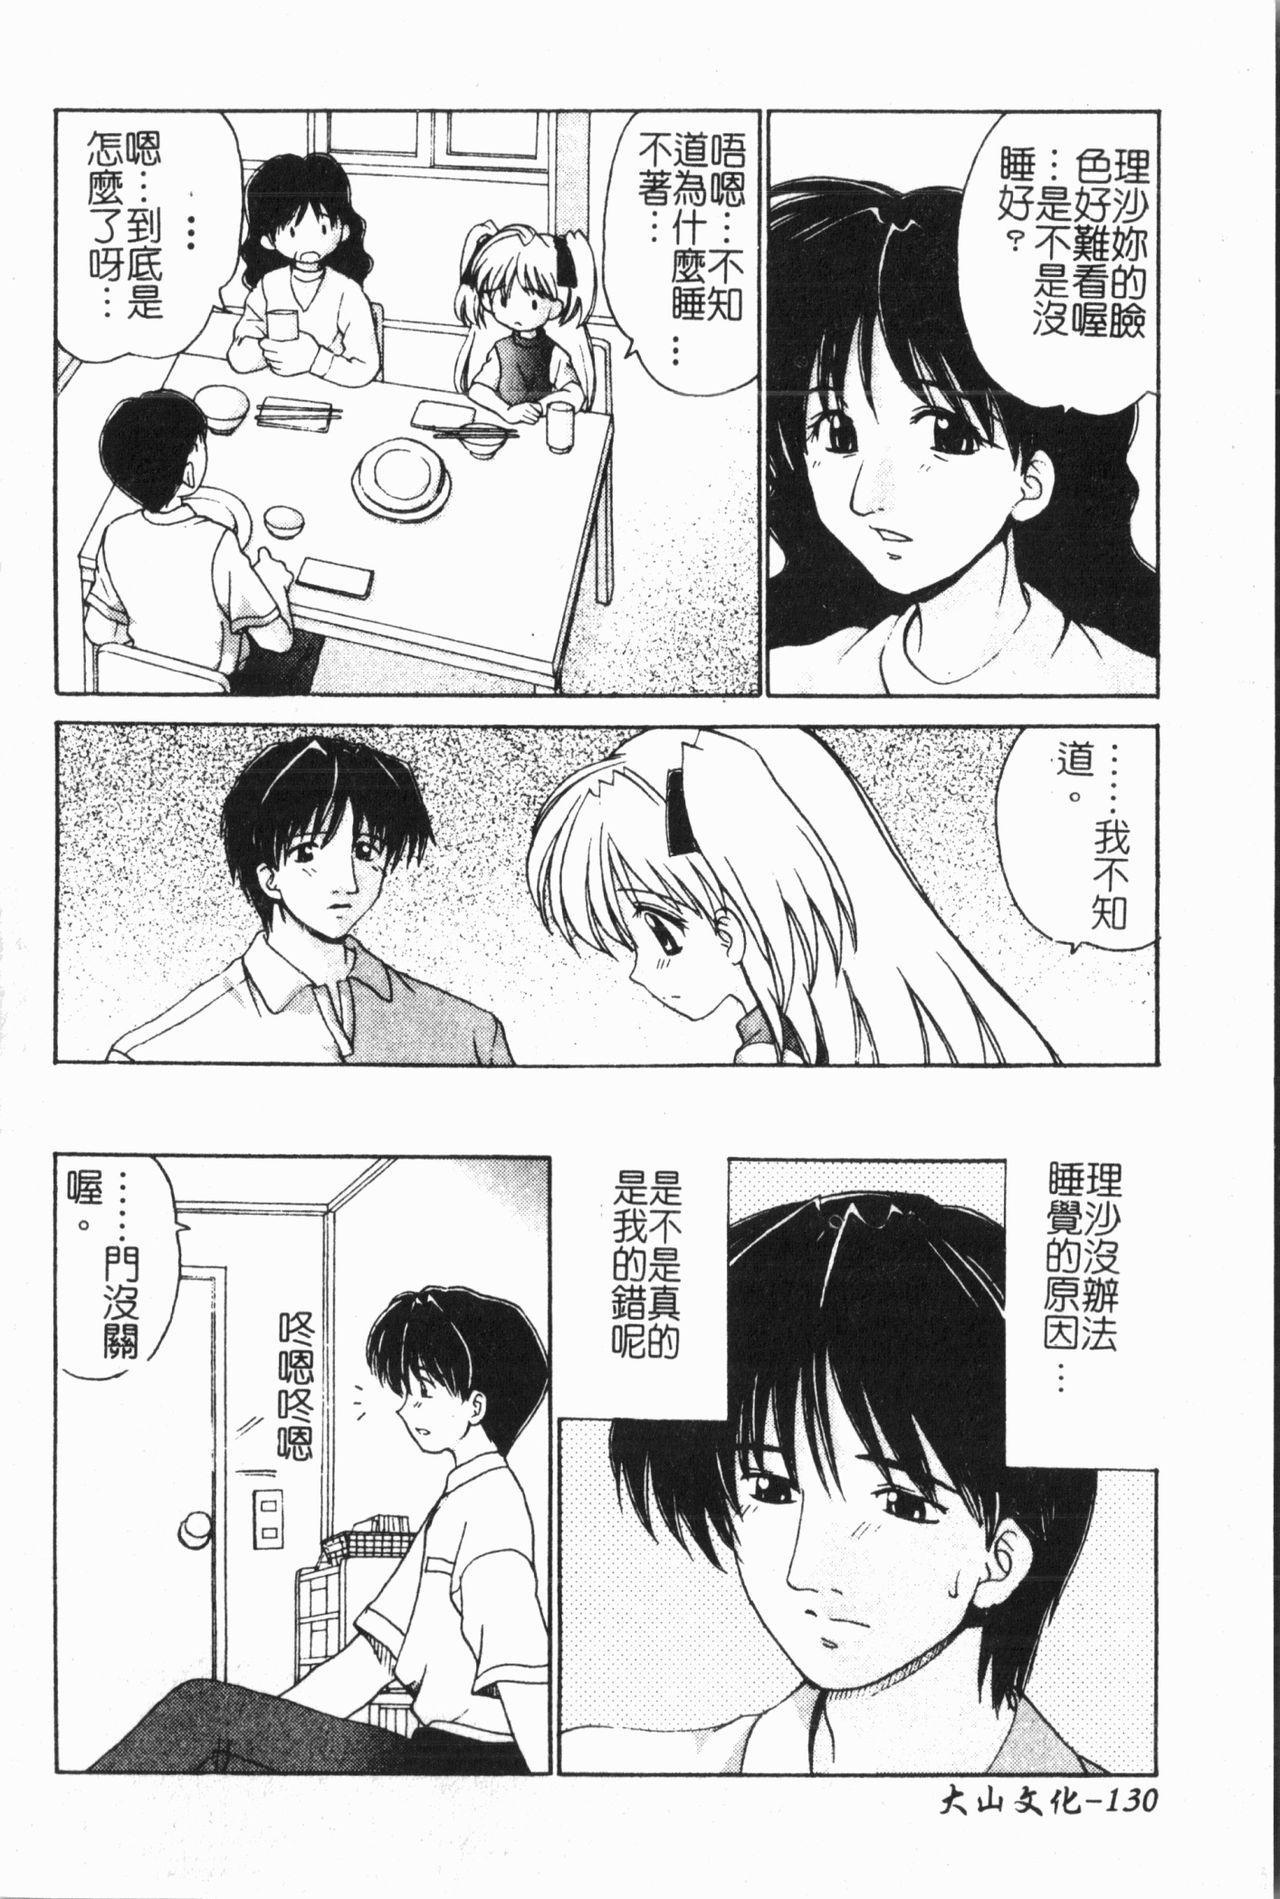 Imouto Koishi 6 132